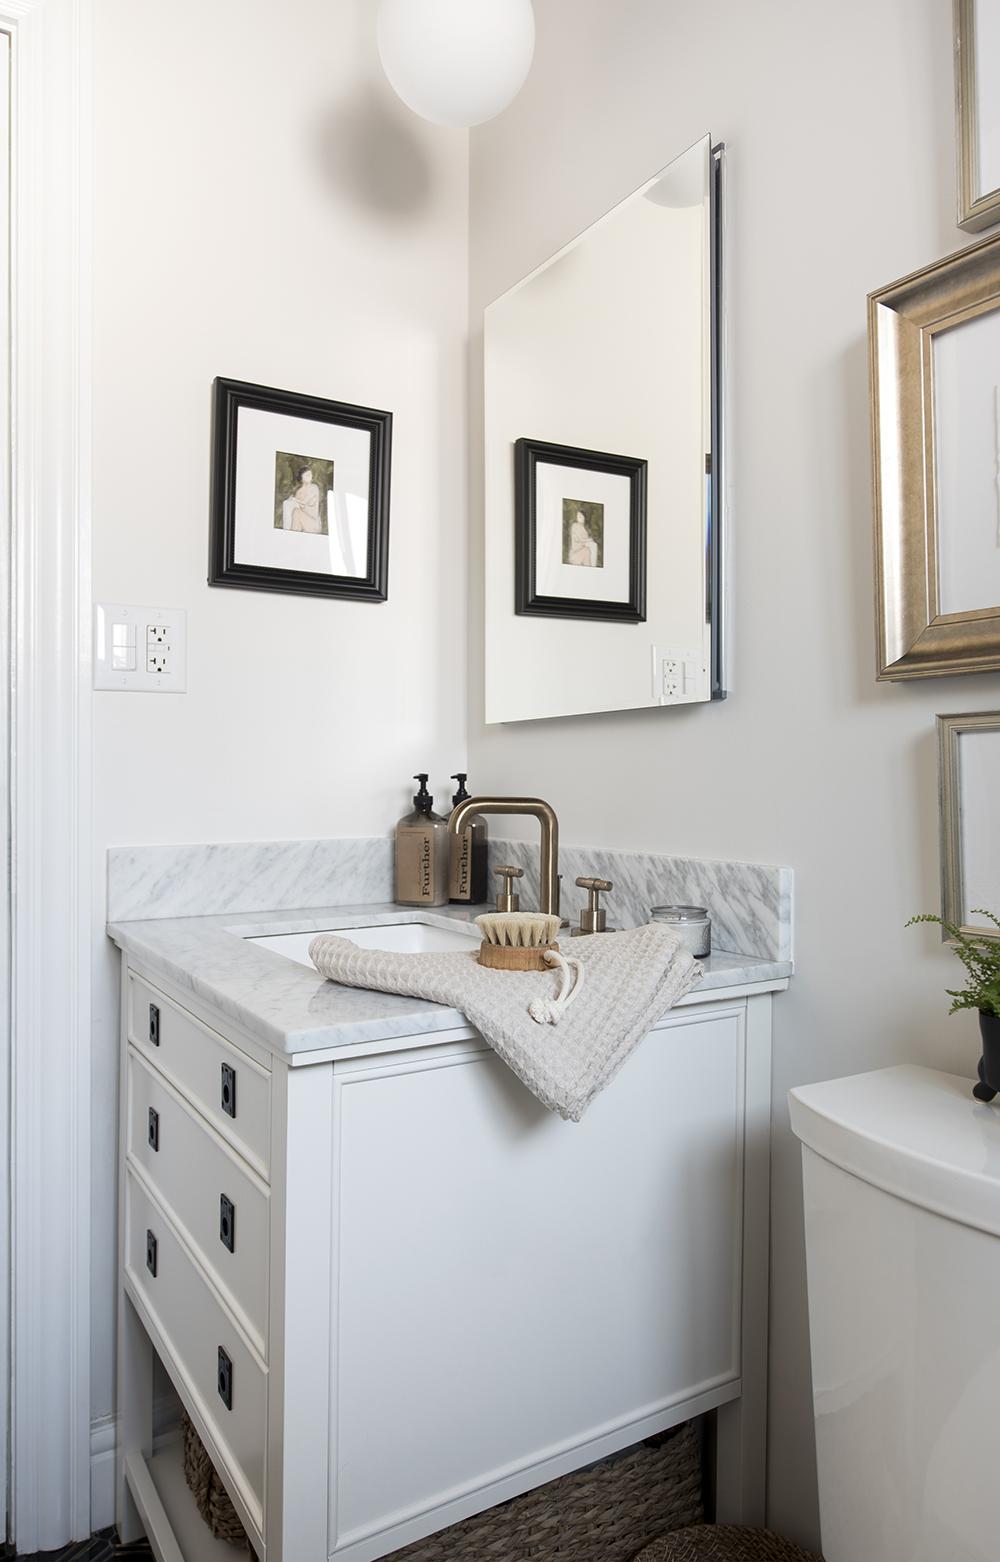 New Bath Towels - roomfortuesday.com